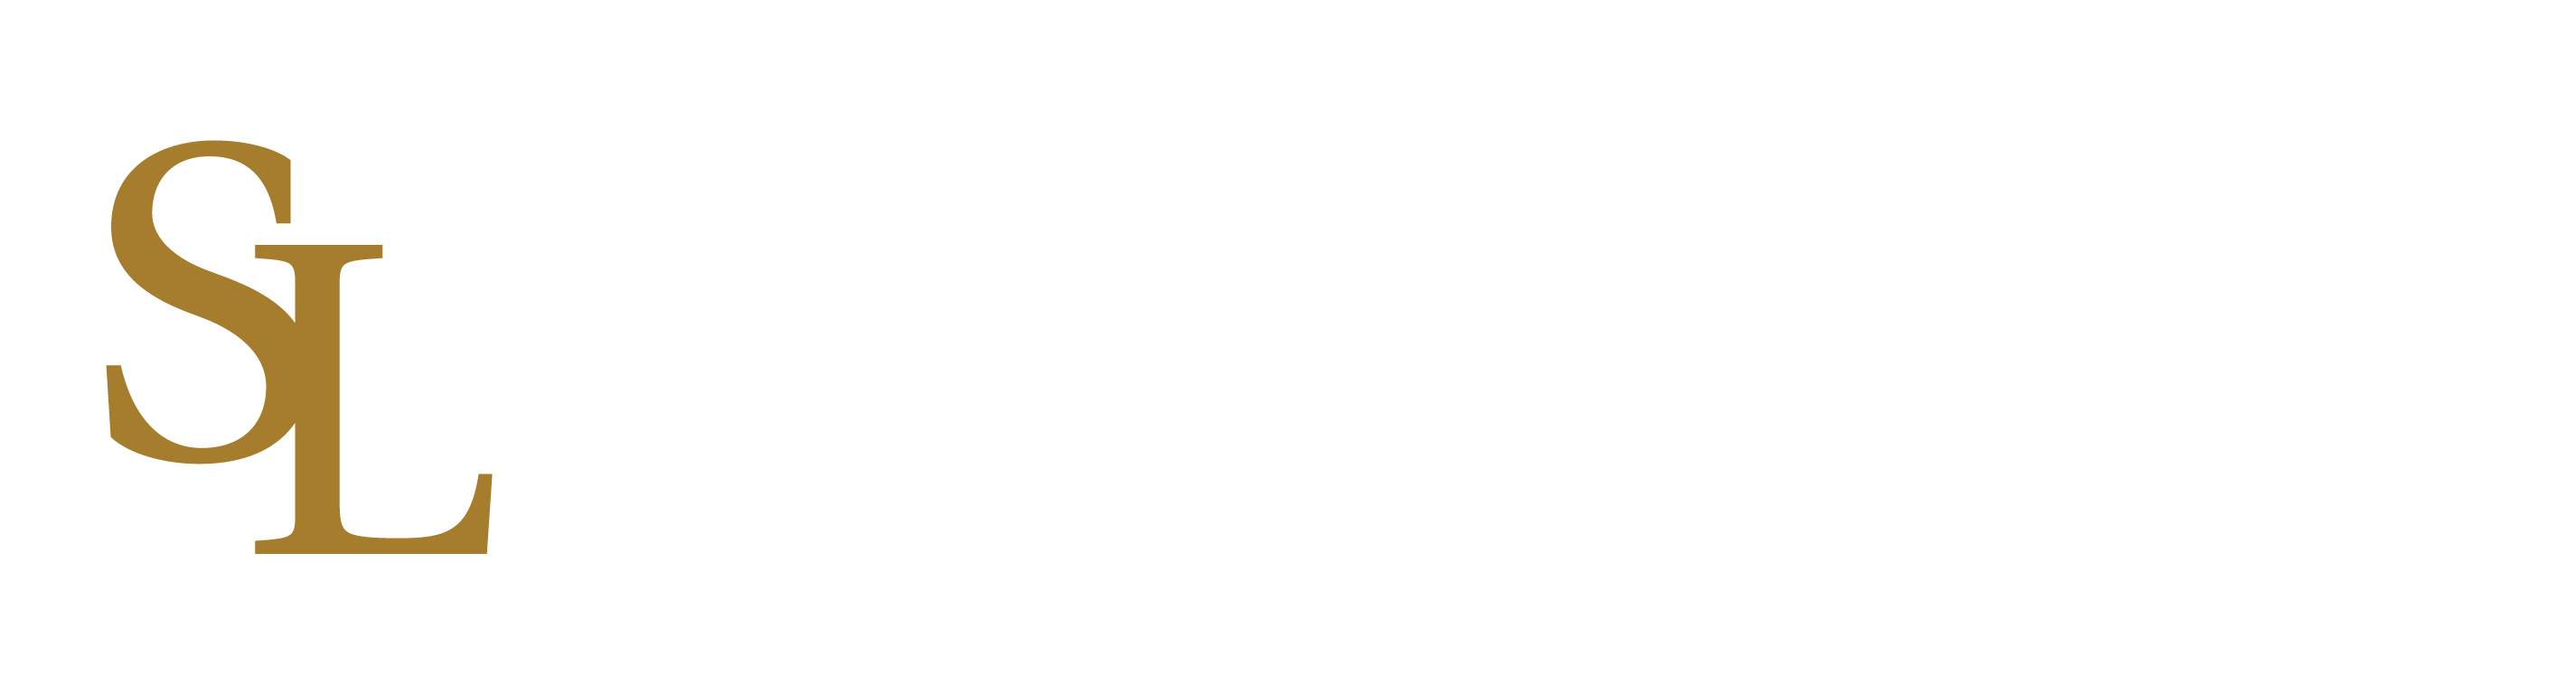 Silberman & Lam, LLP